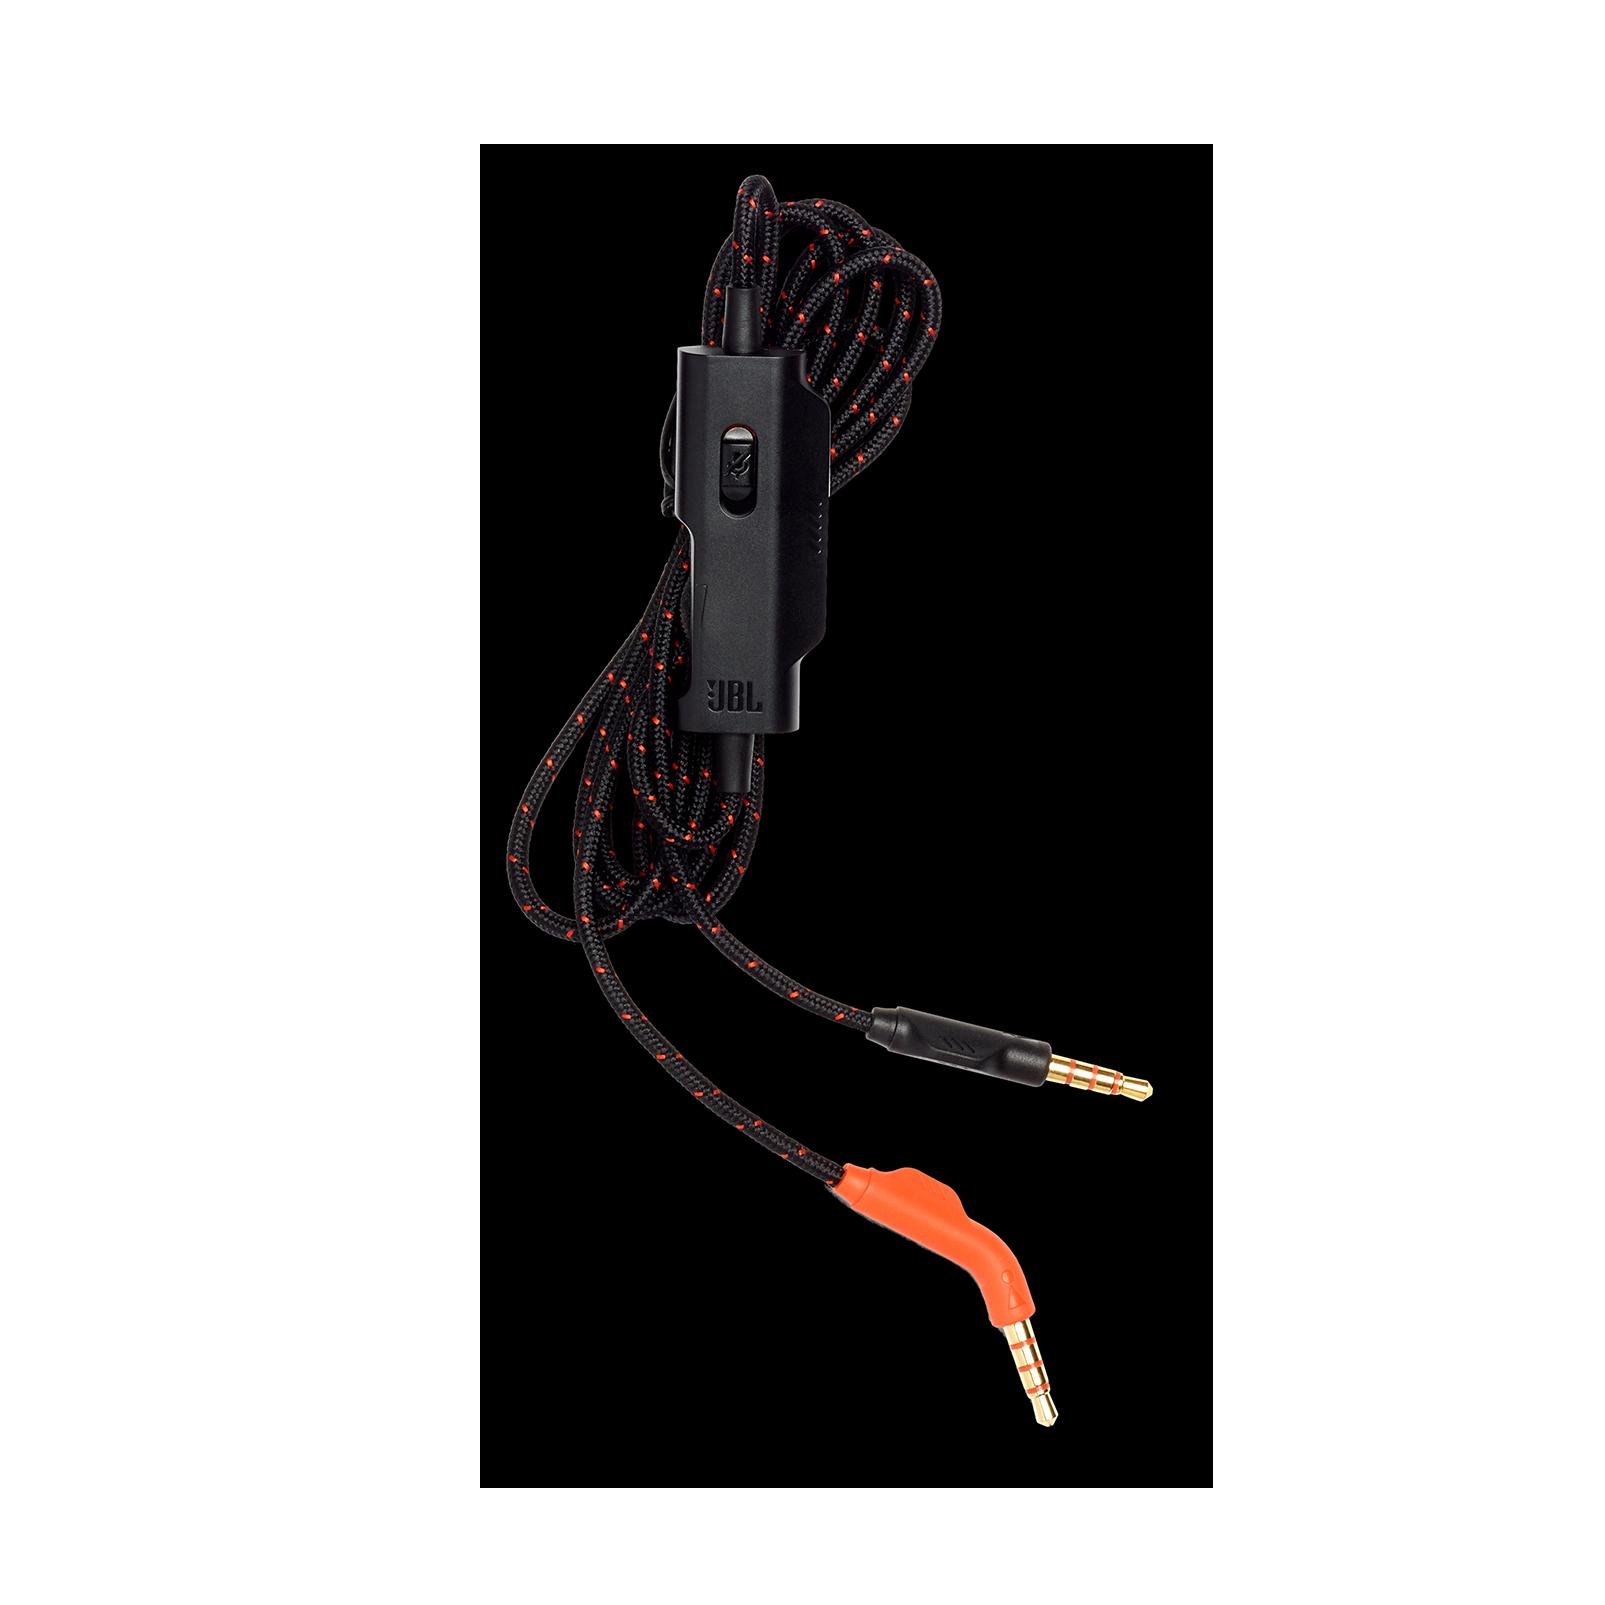 JBL Audio cable for Quantum ONE - Black - Audio cable 3.5mm, 120cm - Hero